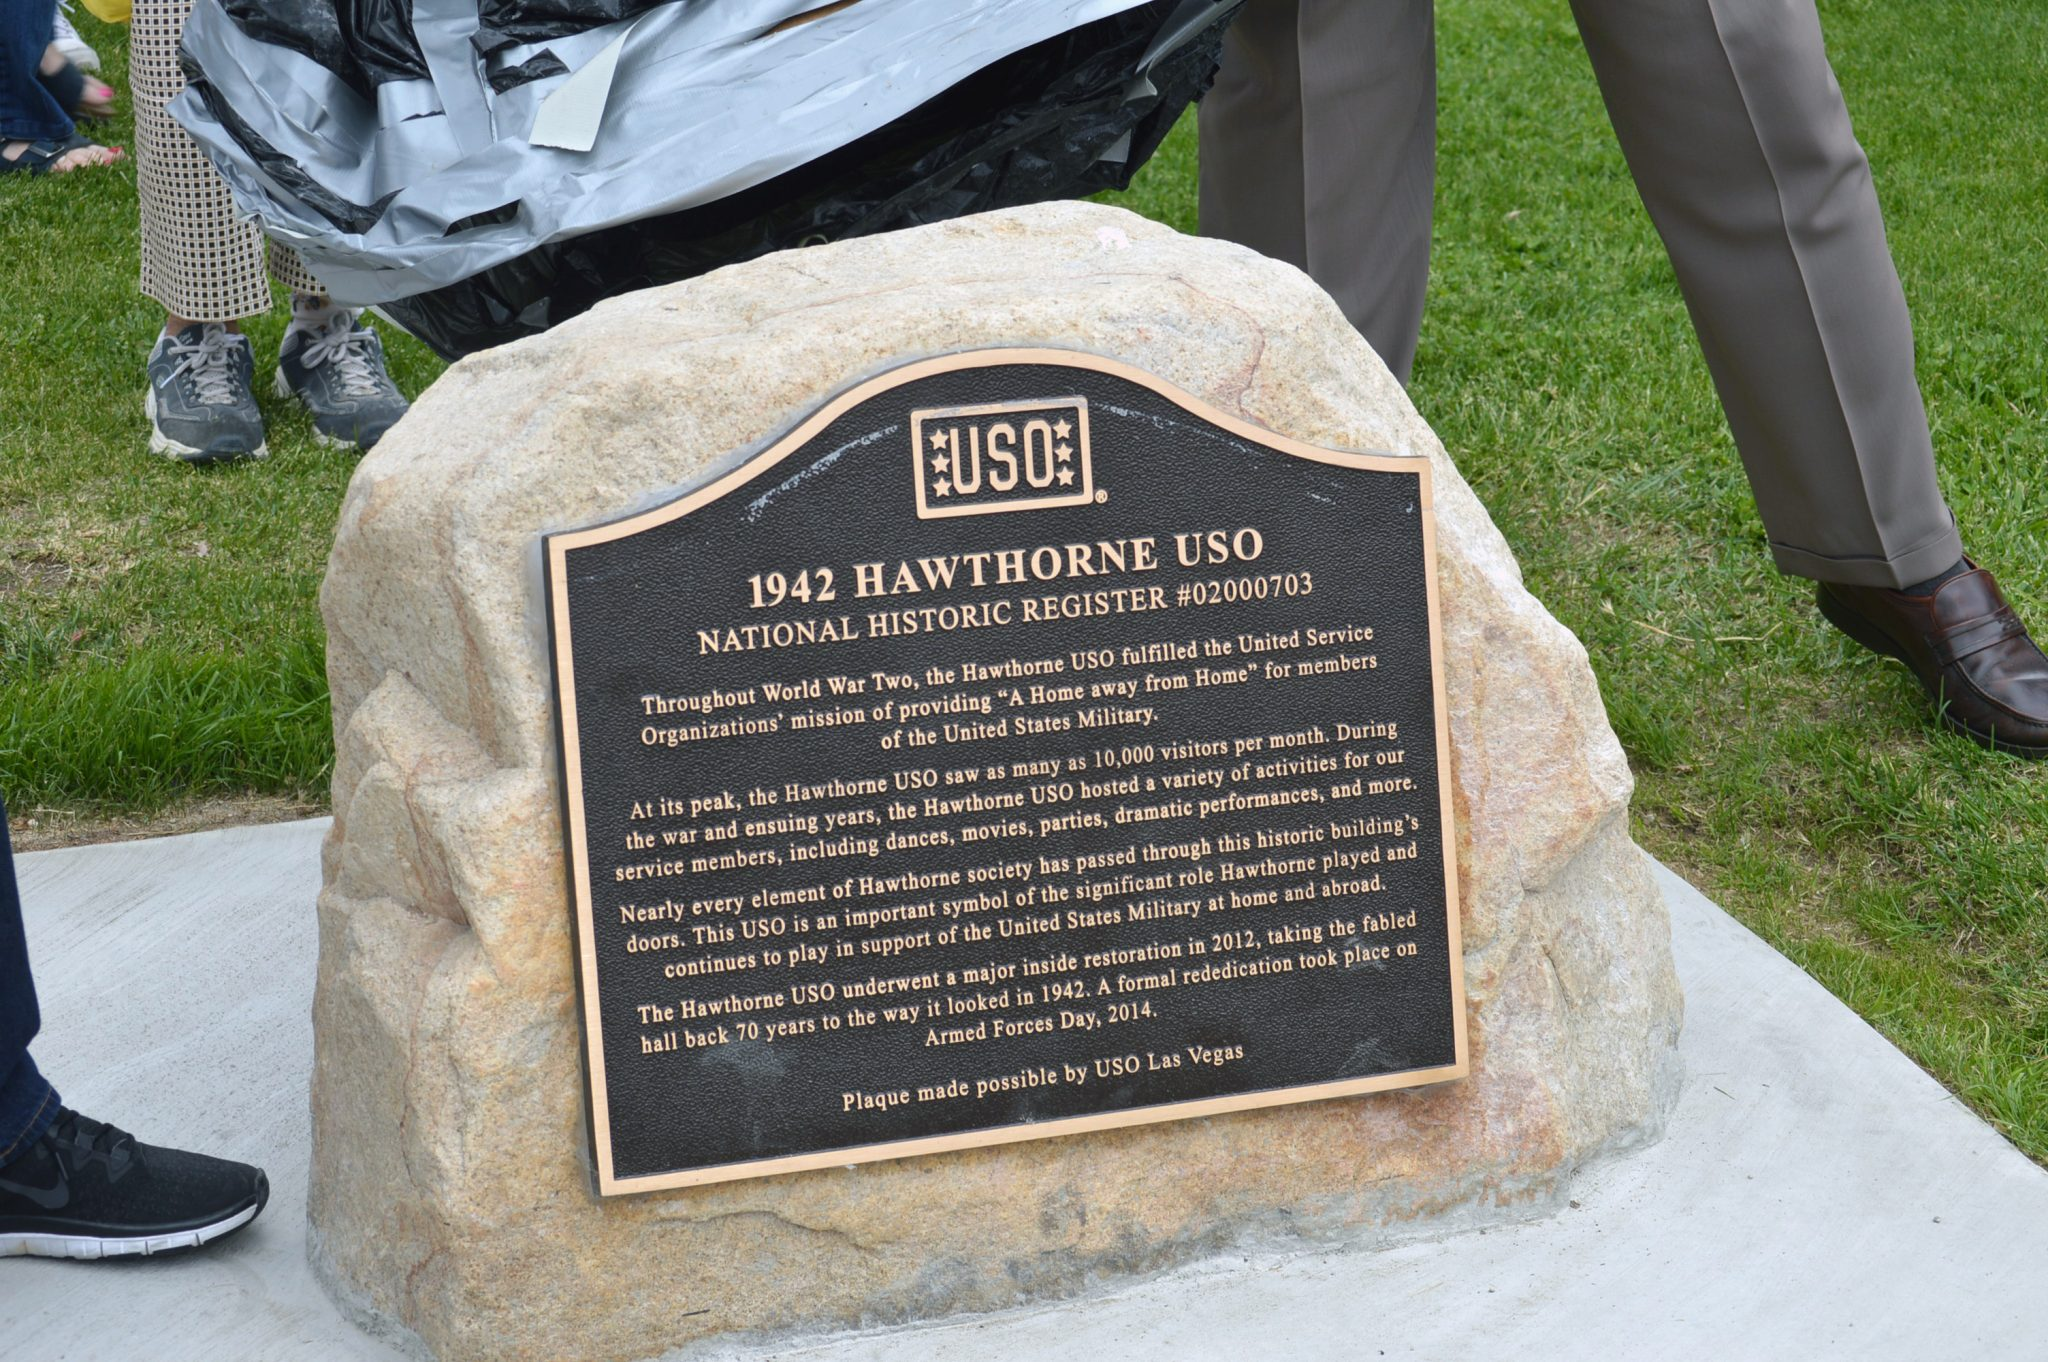 Memorial USO plaque details history of historic building